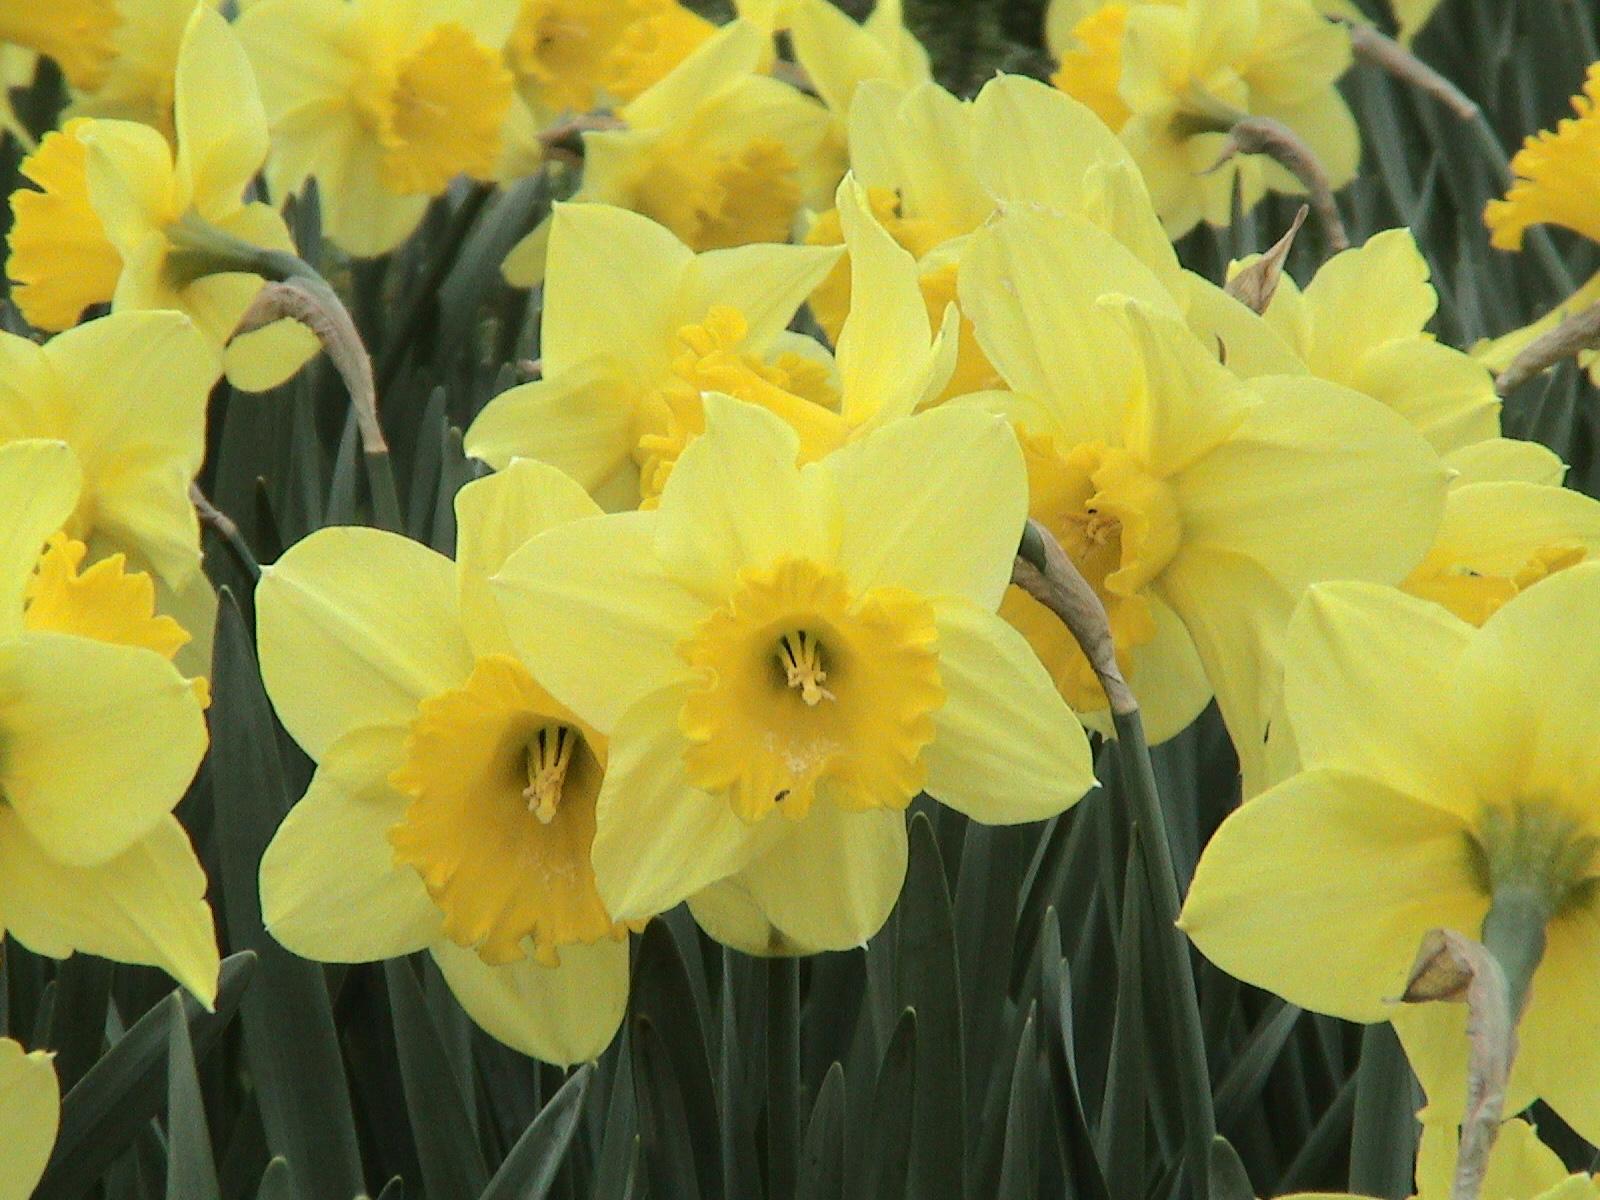 Blooming habits tulips irises and daffodils flowers blooming habits daffodils mightylinksfo